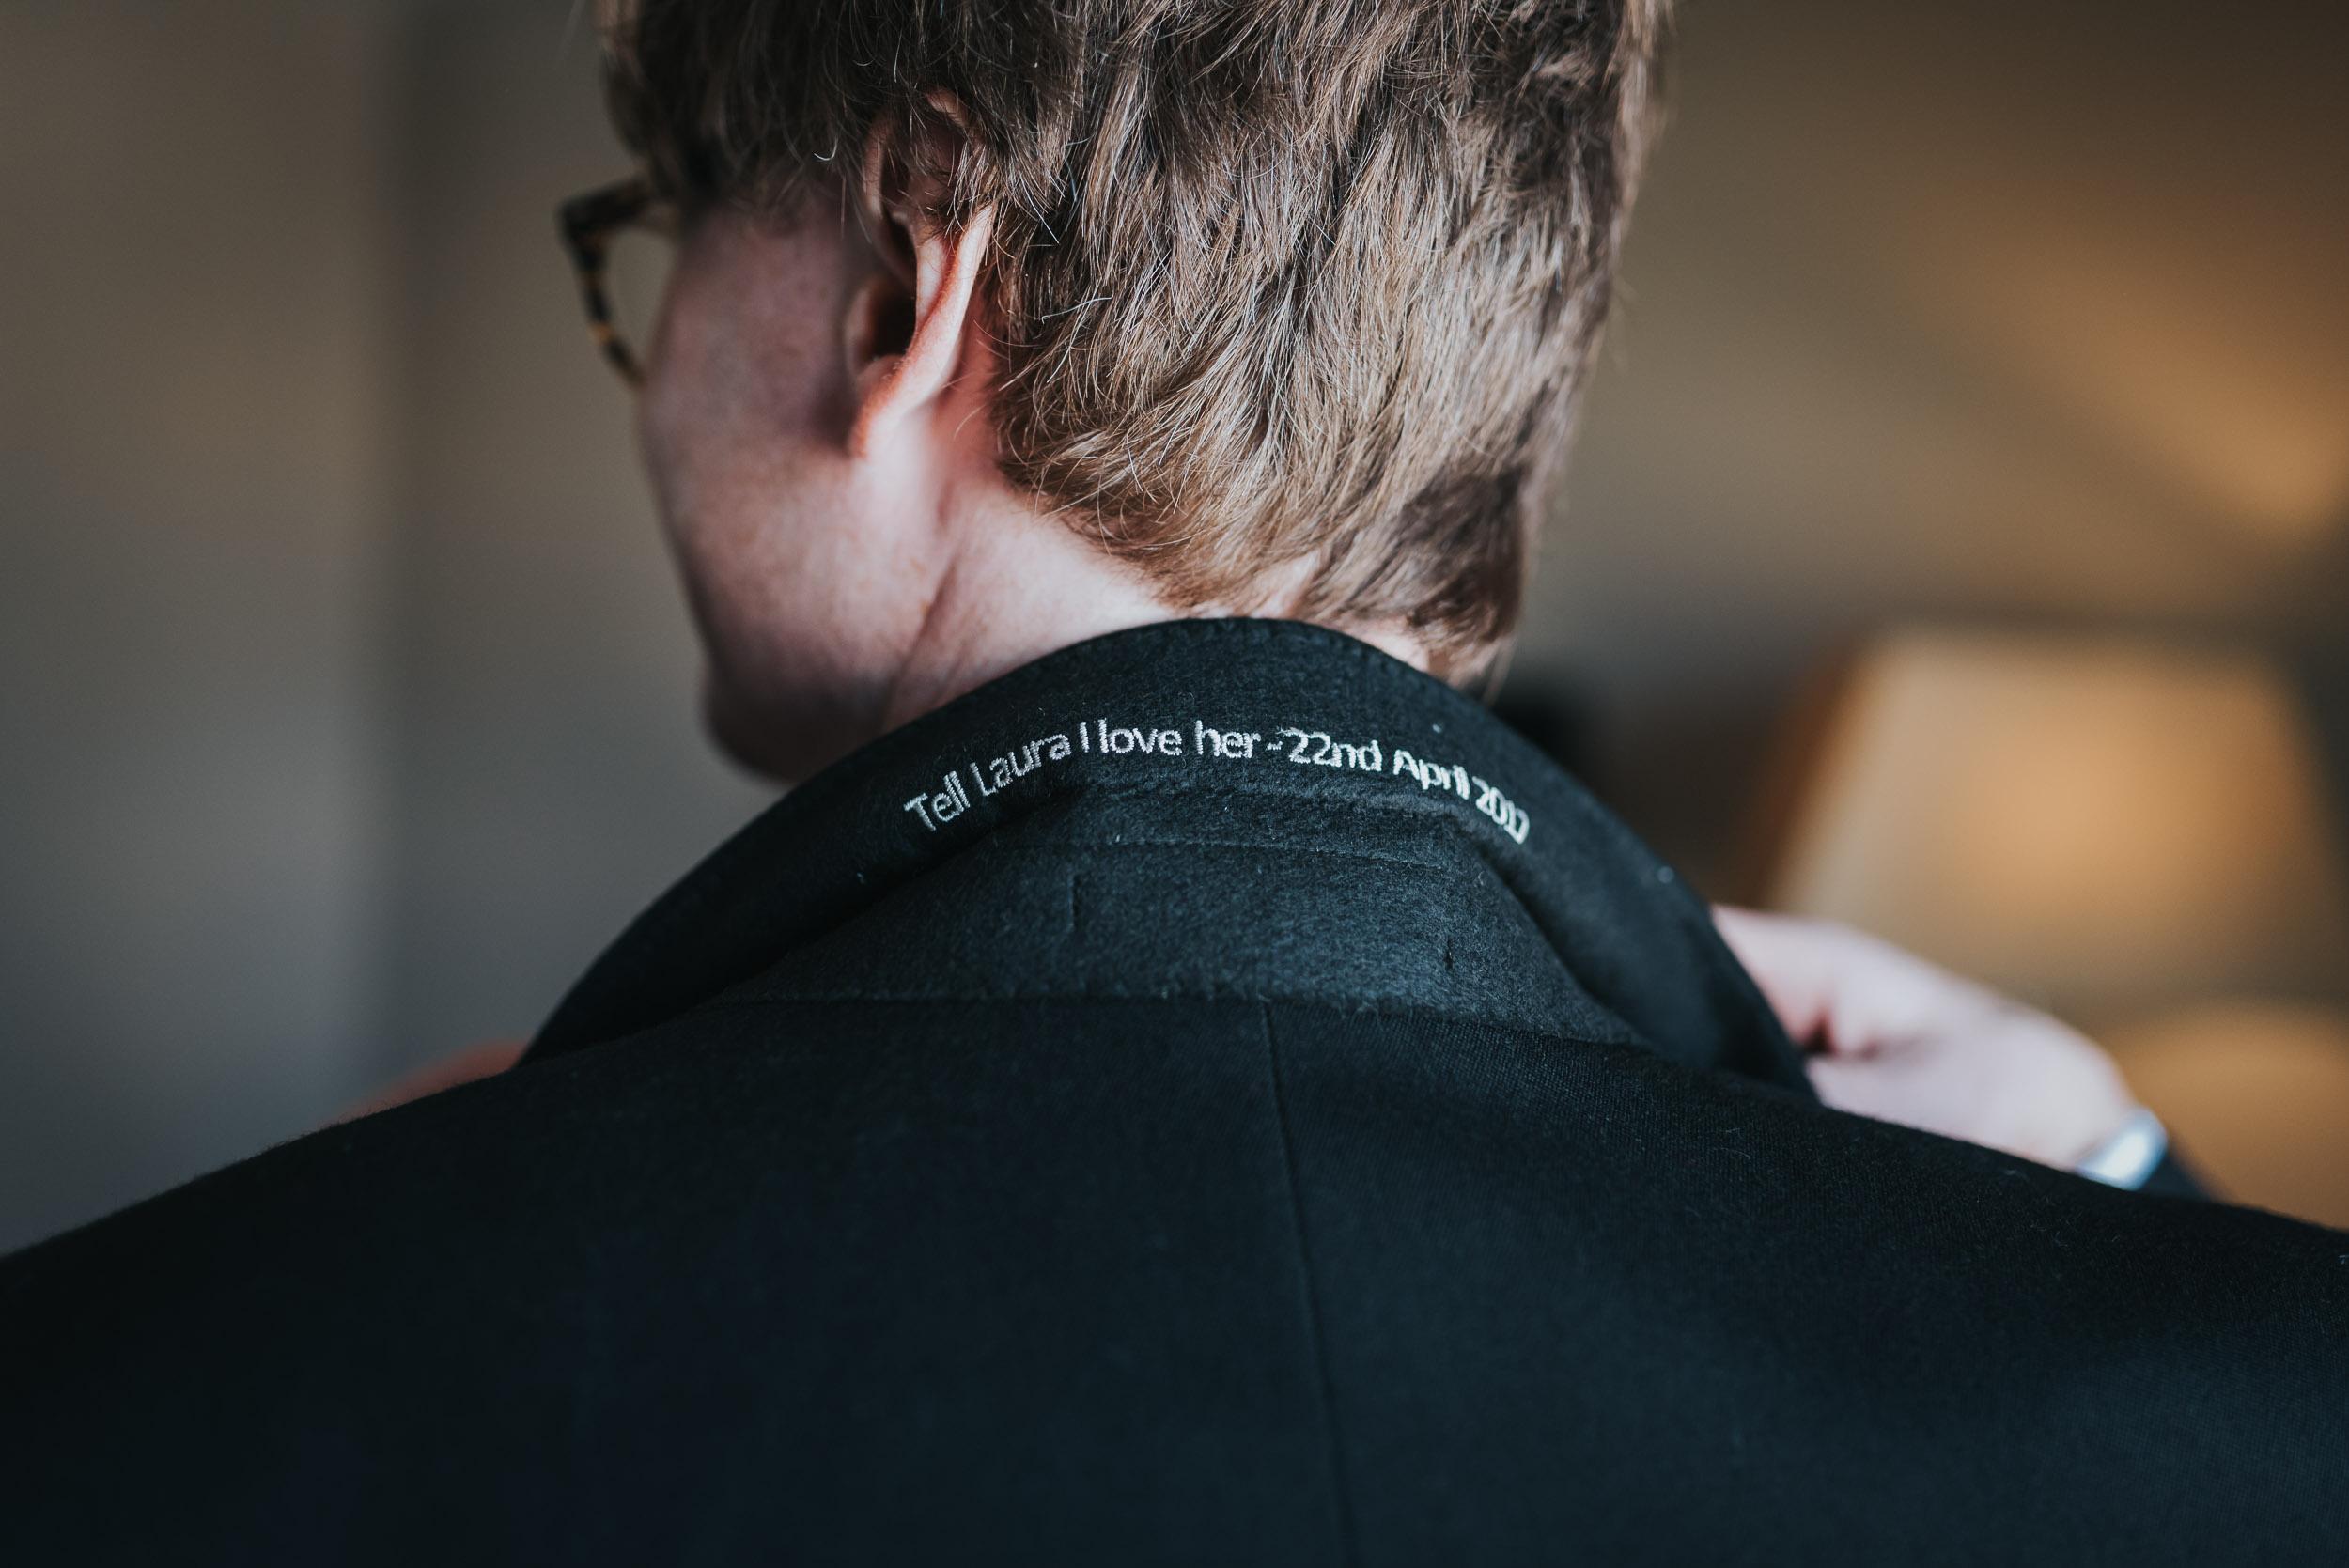 hamswell-house-wedding-w21.jpg